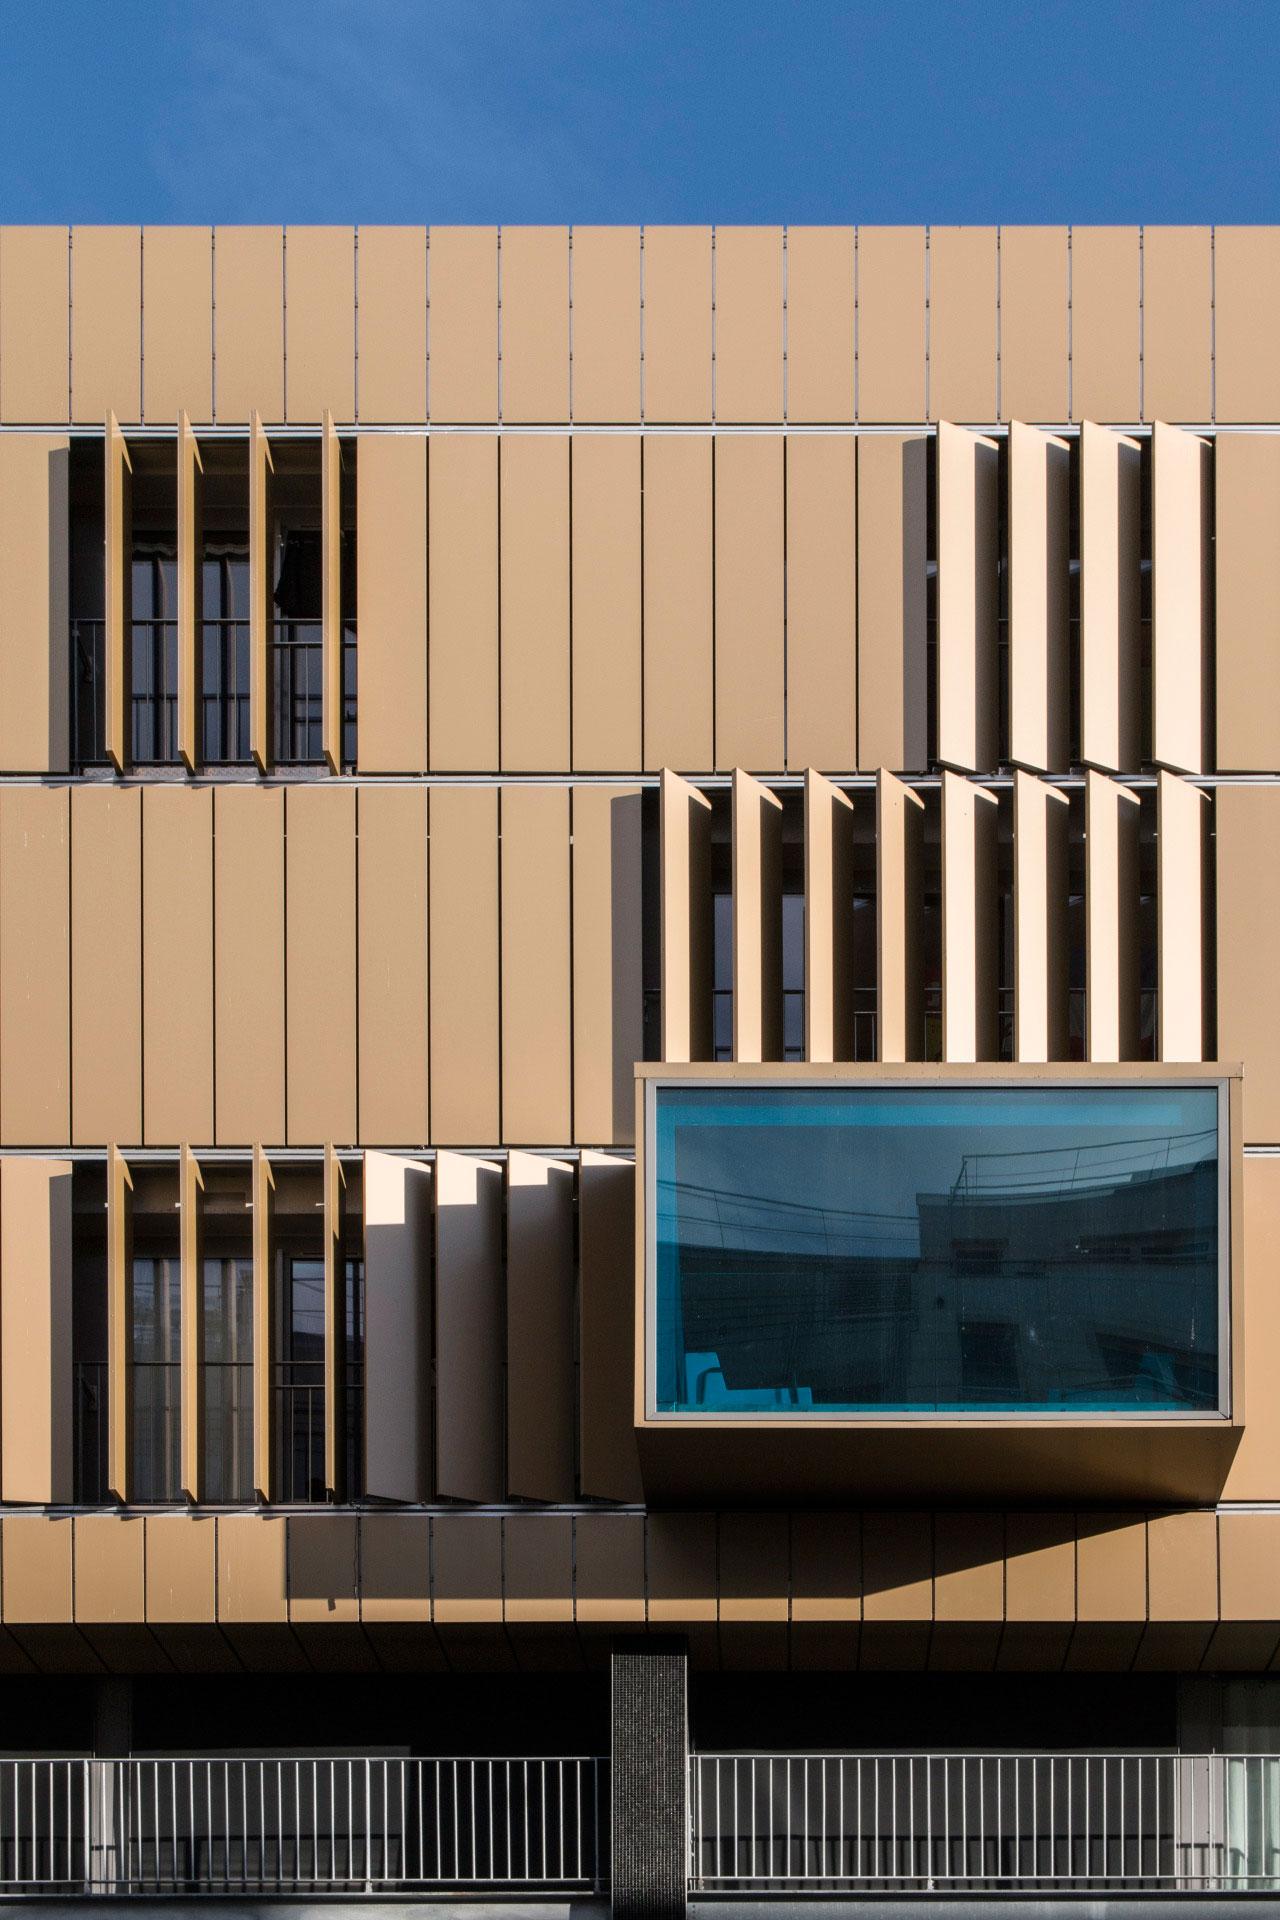 Responsive Facades, Alucobond, Rue de Bercy, Audren et Schlumberger, Photography Manuel Panaget